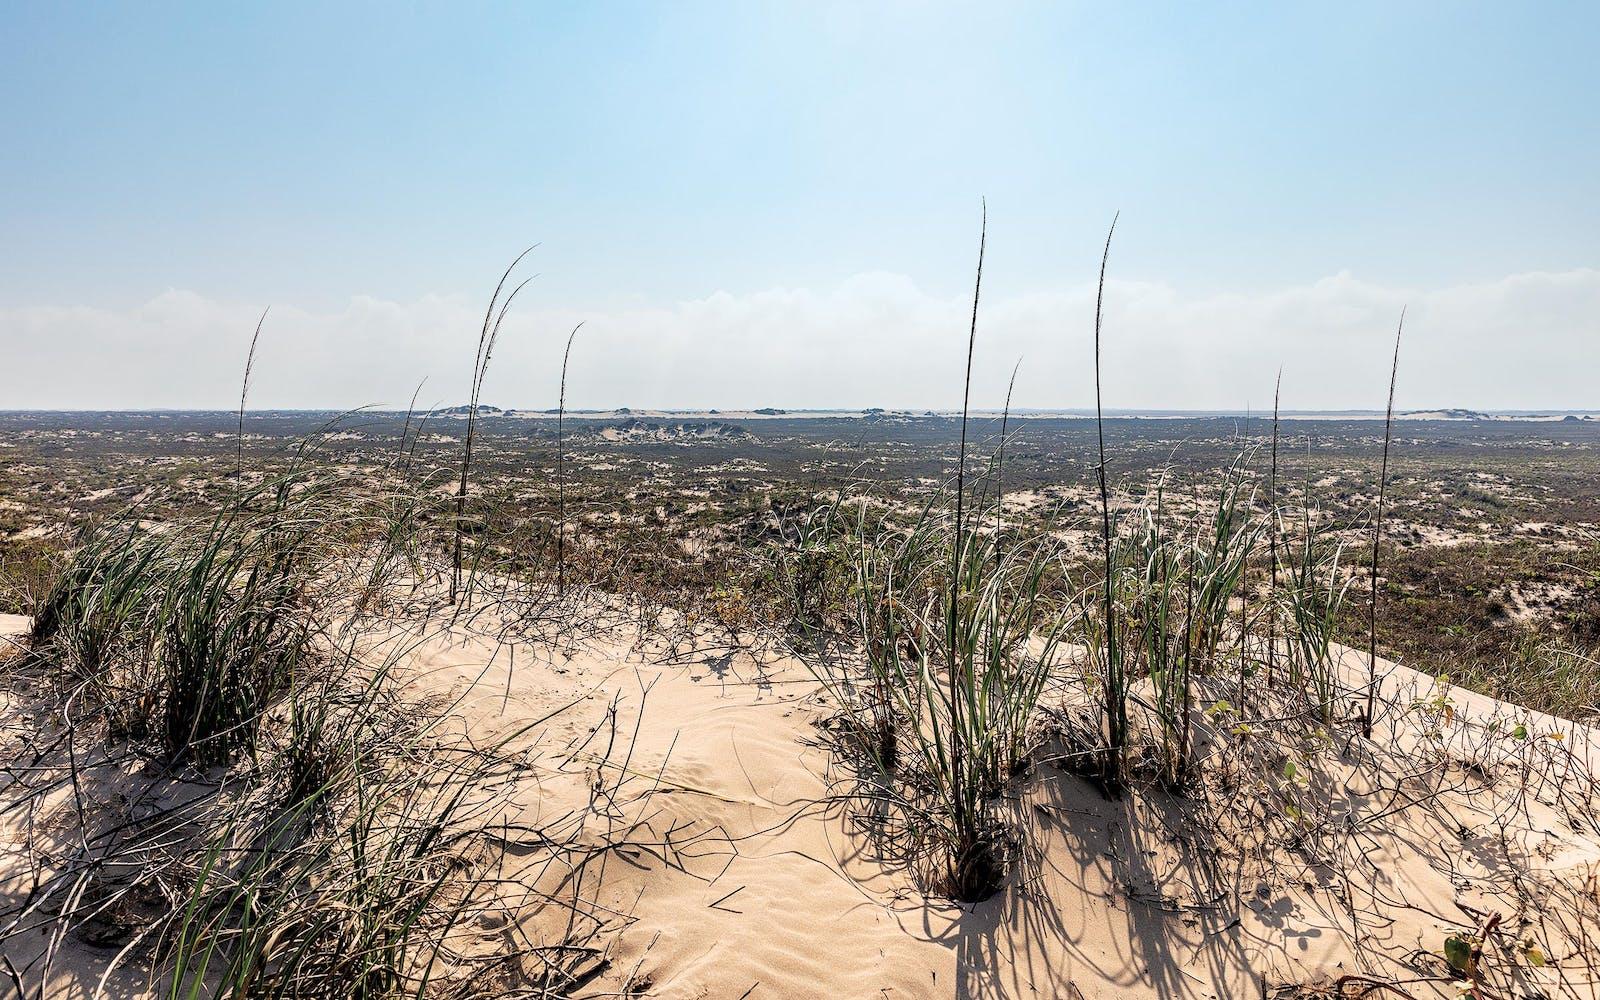 David Courtney, The Texanist, traverses Padre Island National Seashore